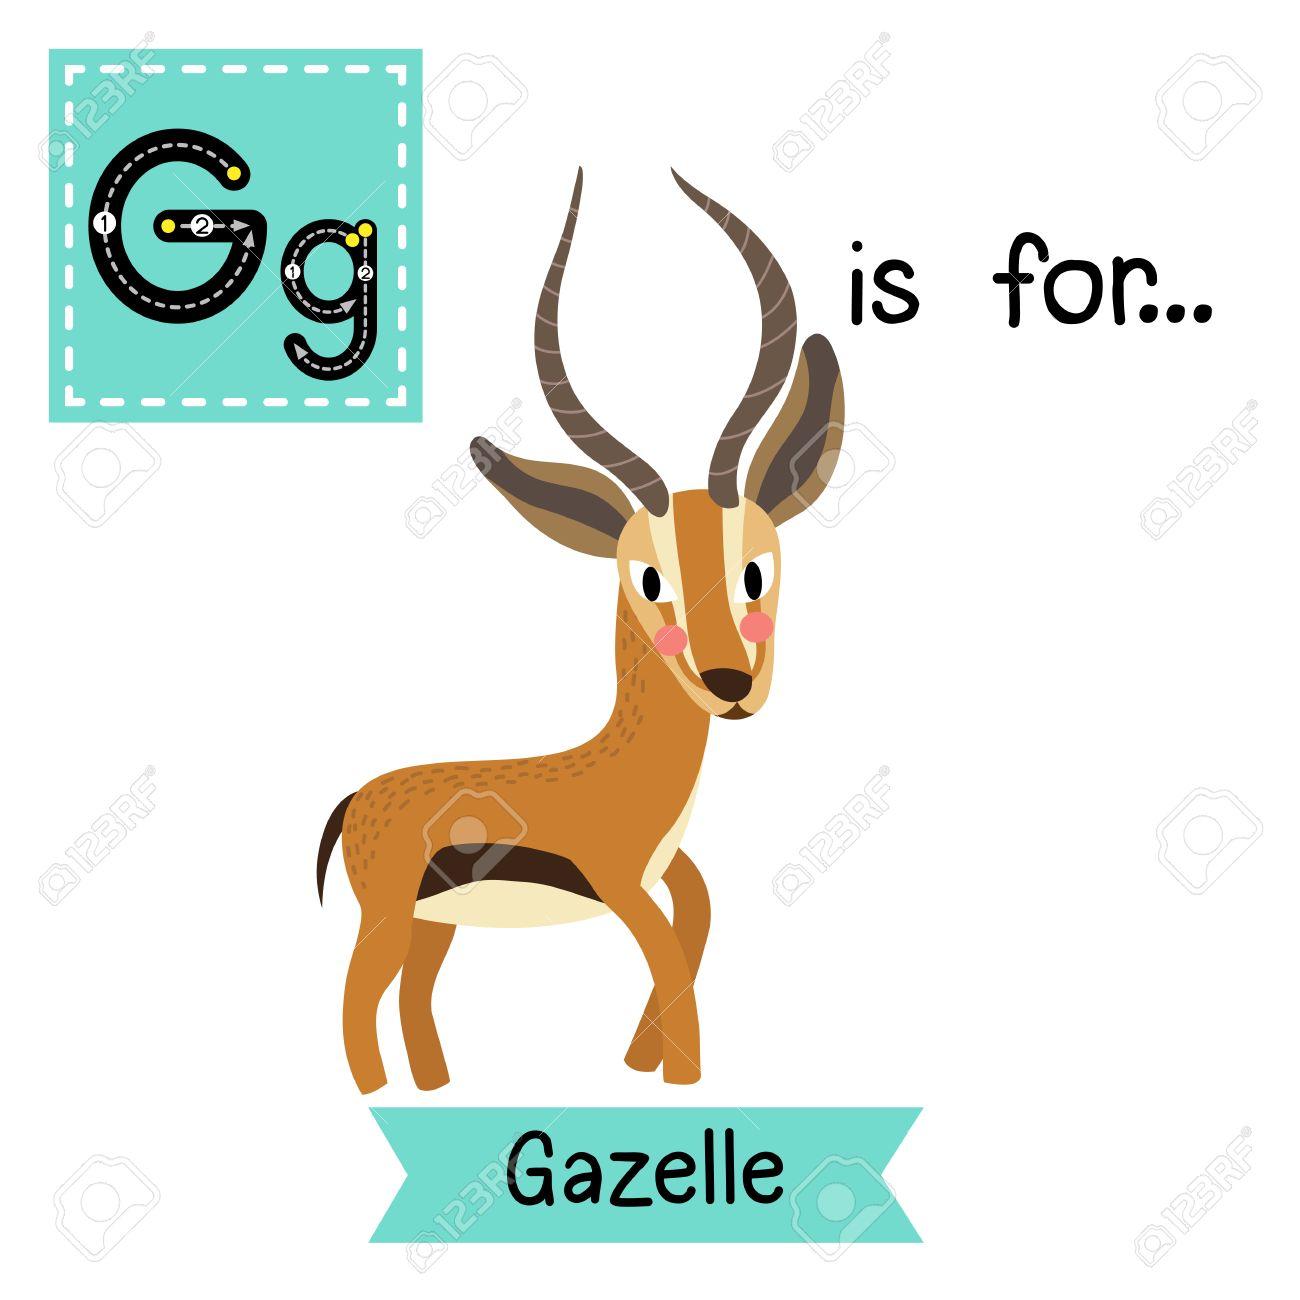 g letter tracing standing gazelle cute children zoo alphabet